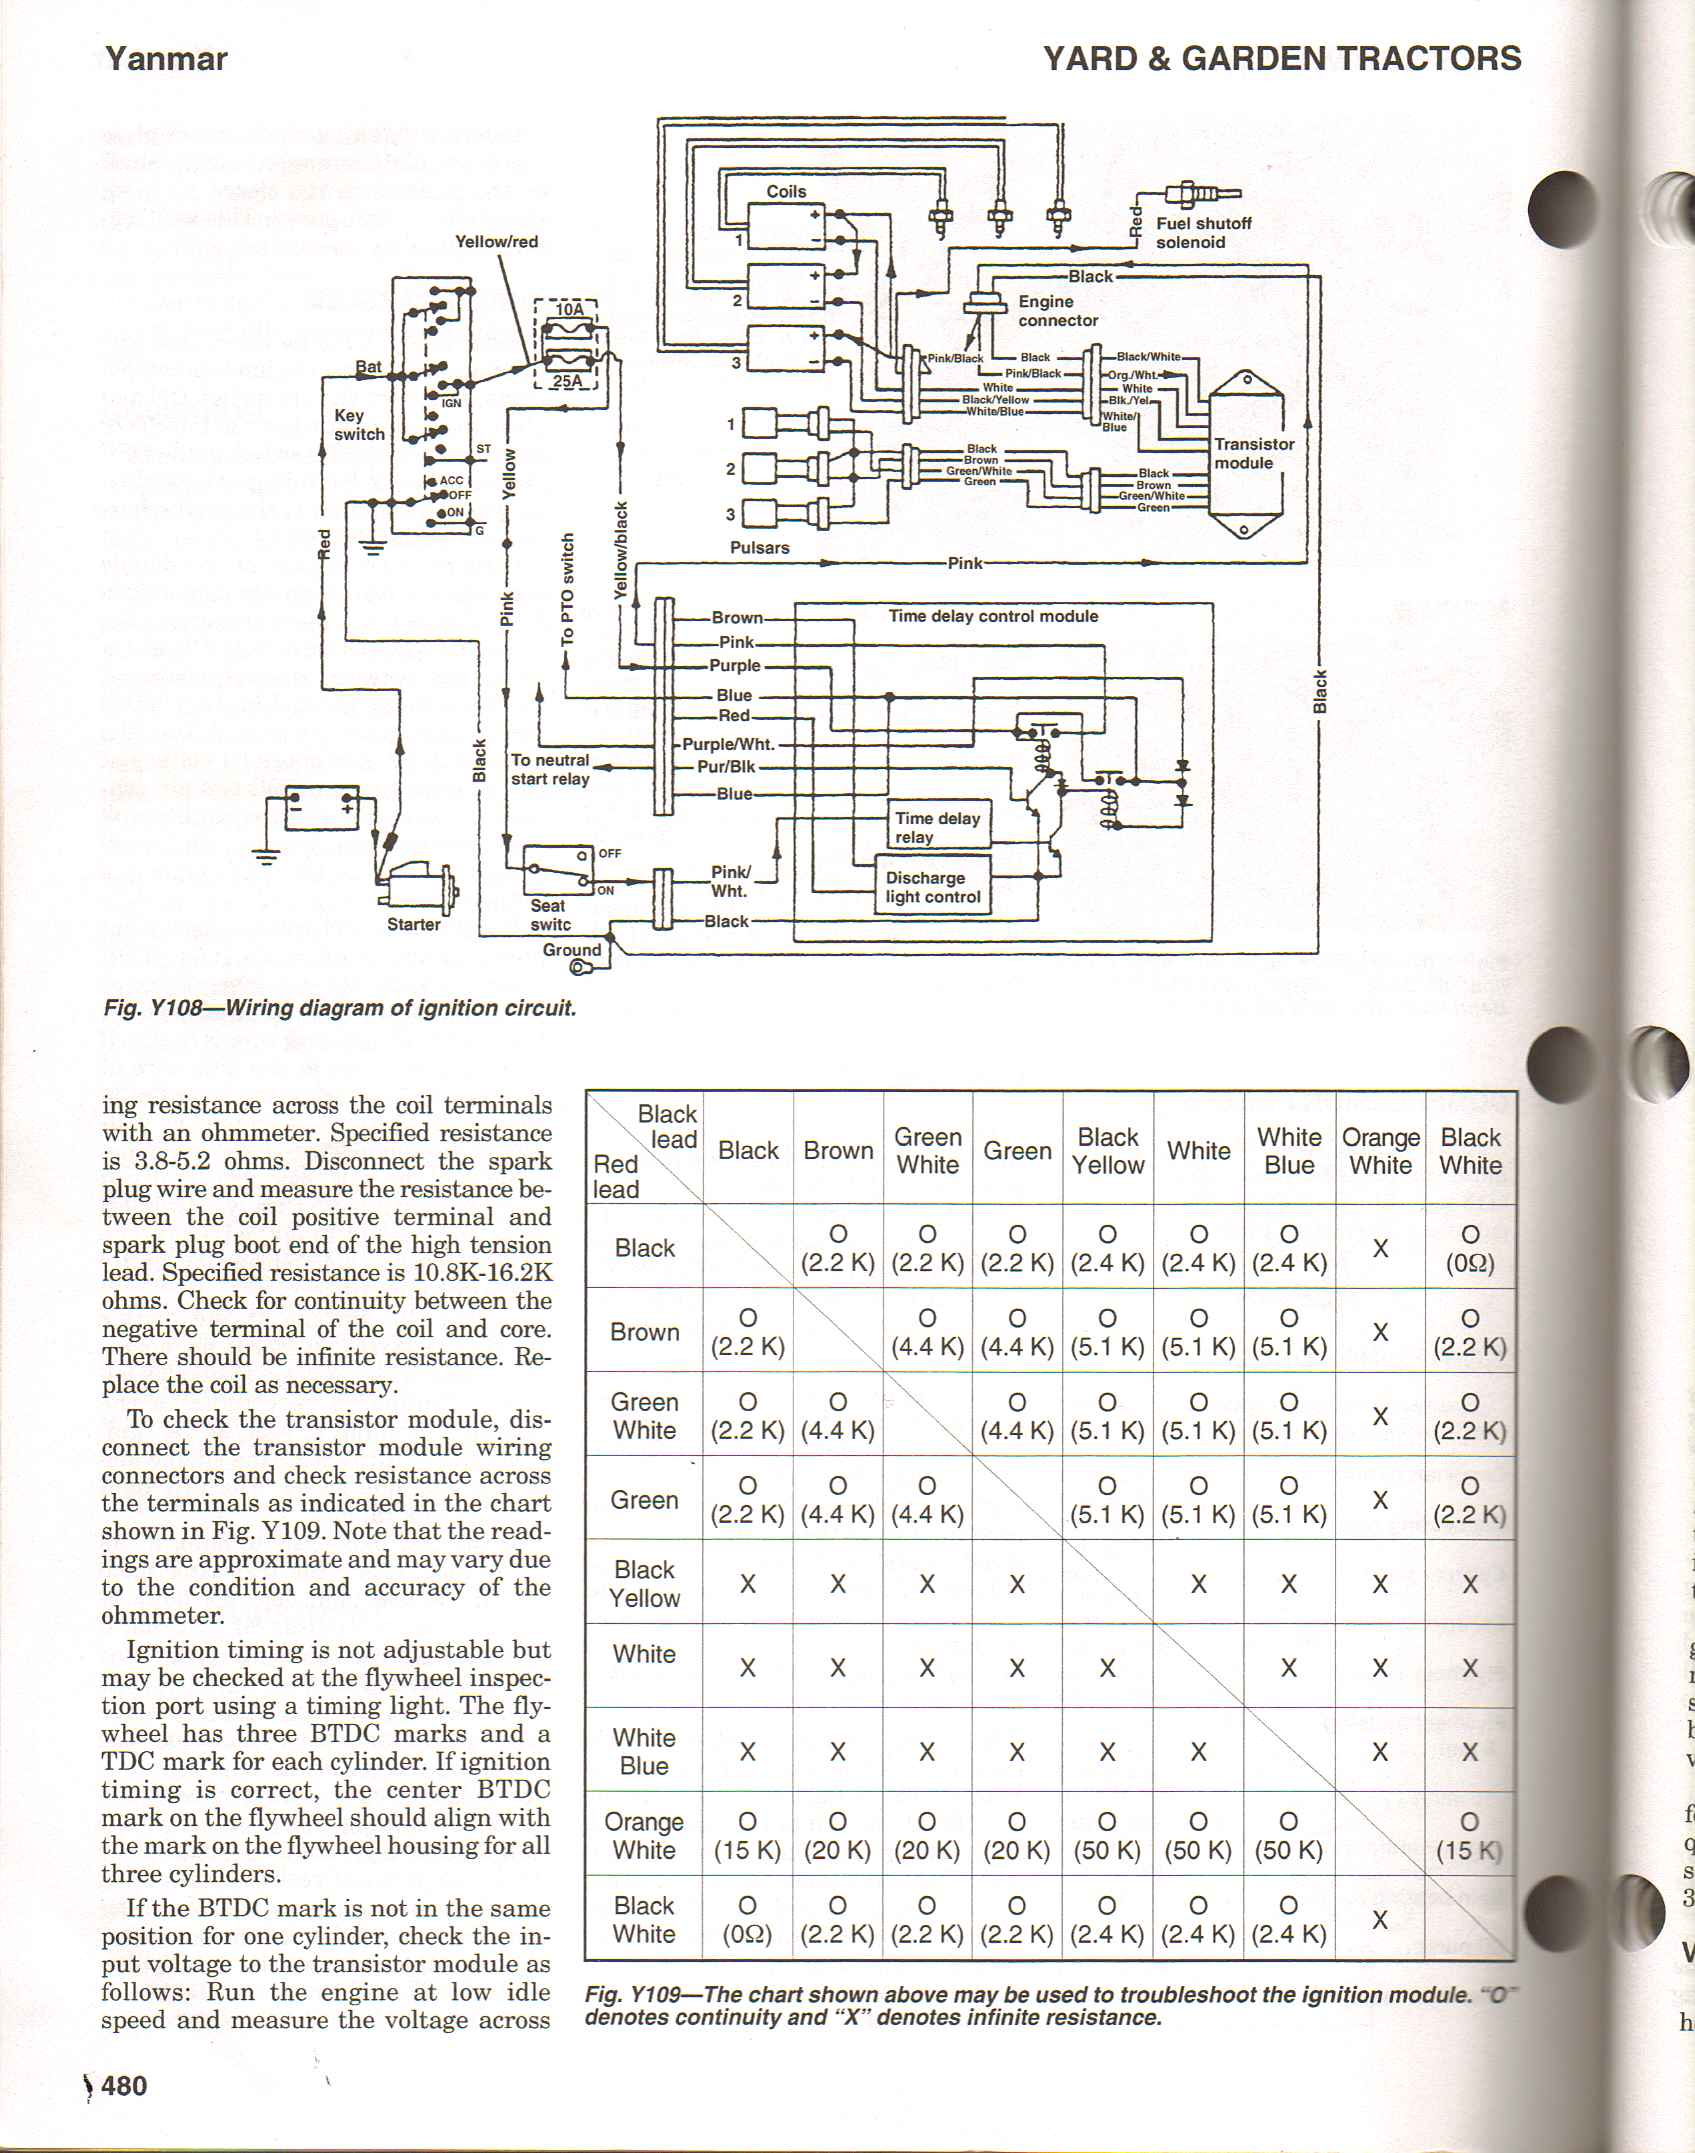 John Deere 322 Wiring Harness Toyota 24 Engine Diagram Toyota 4 – John Deere 322 Wiring-diagram